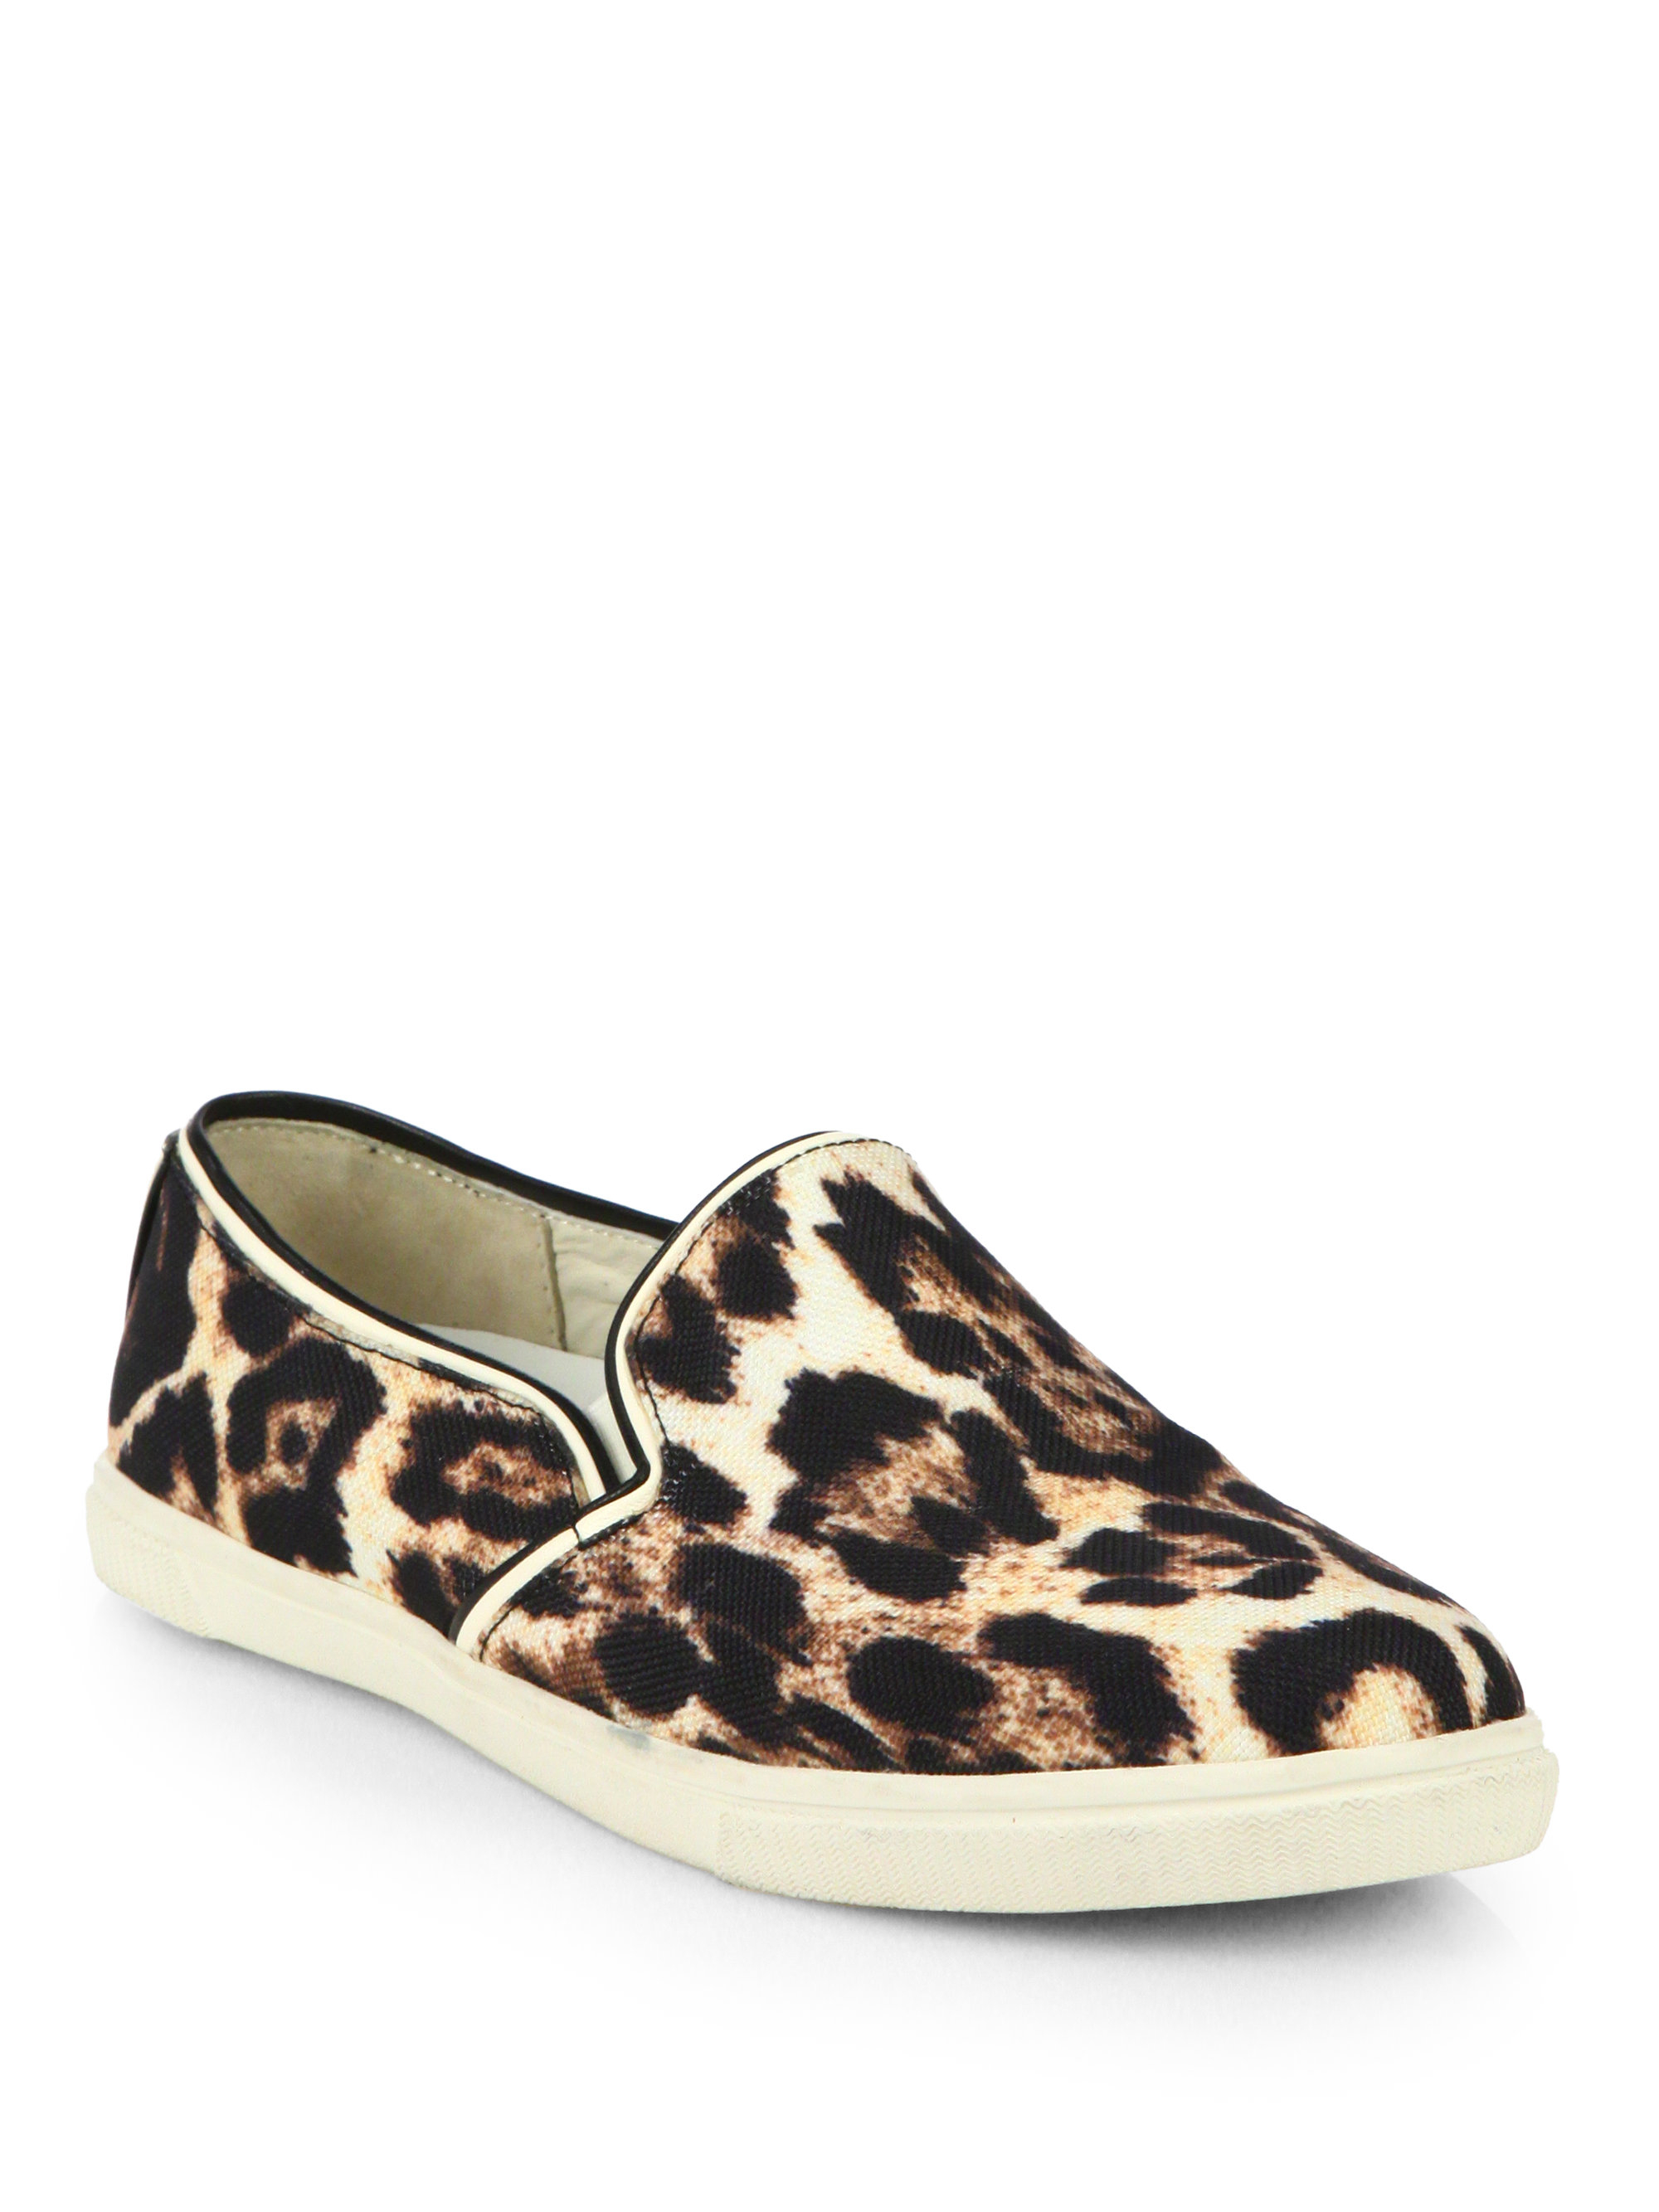 Alice Olivia Pamela Leopardprint Sneakers In Brown Lyst